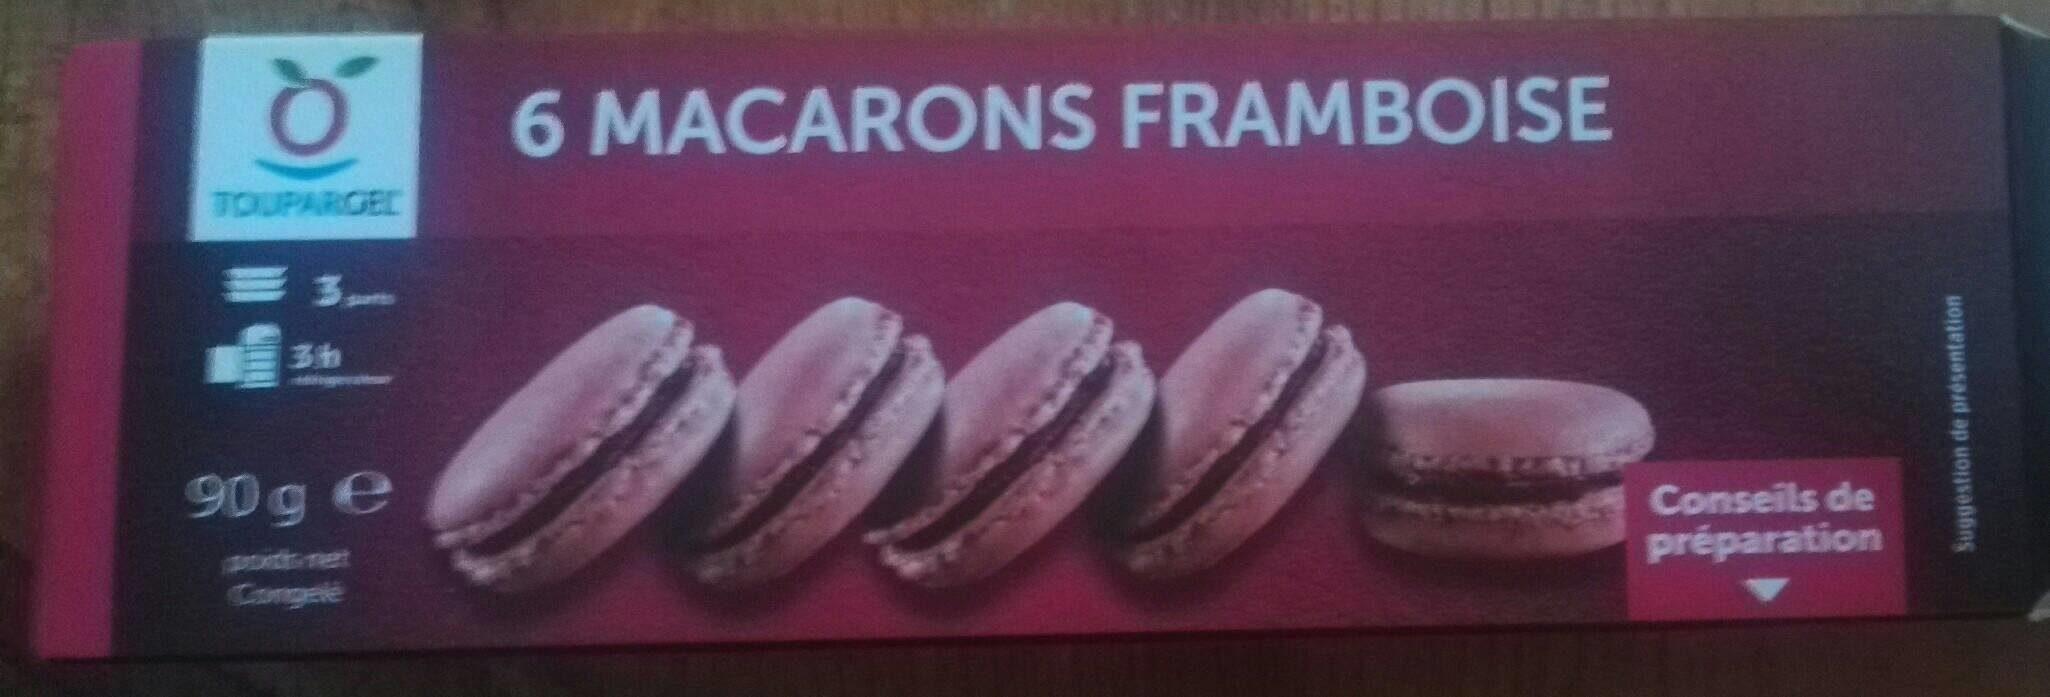 Macarons framboise - Product